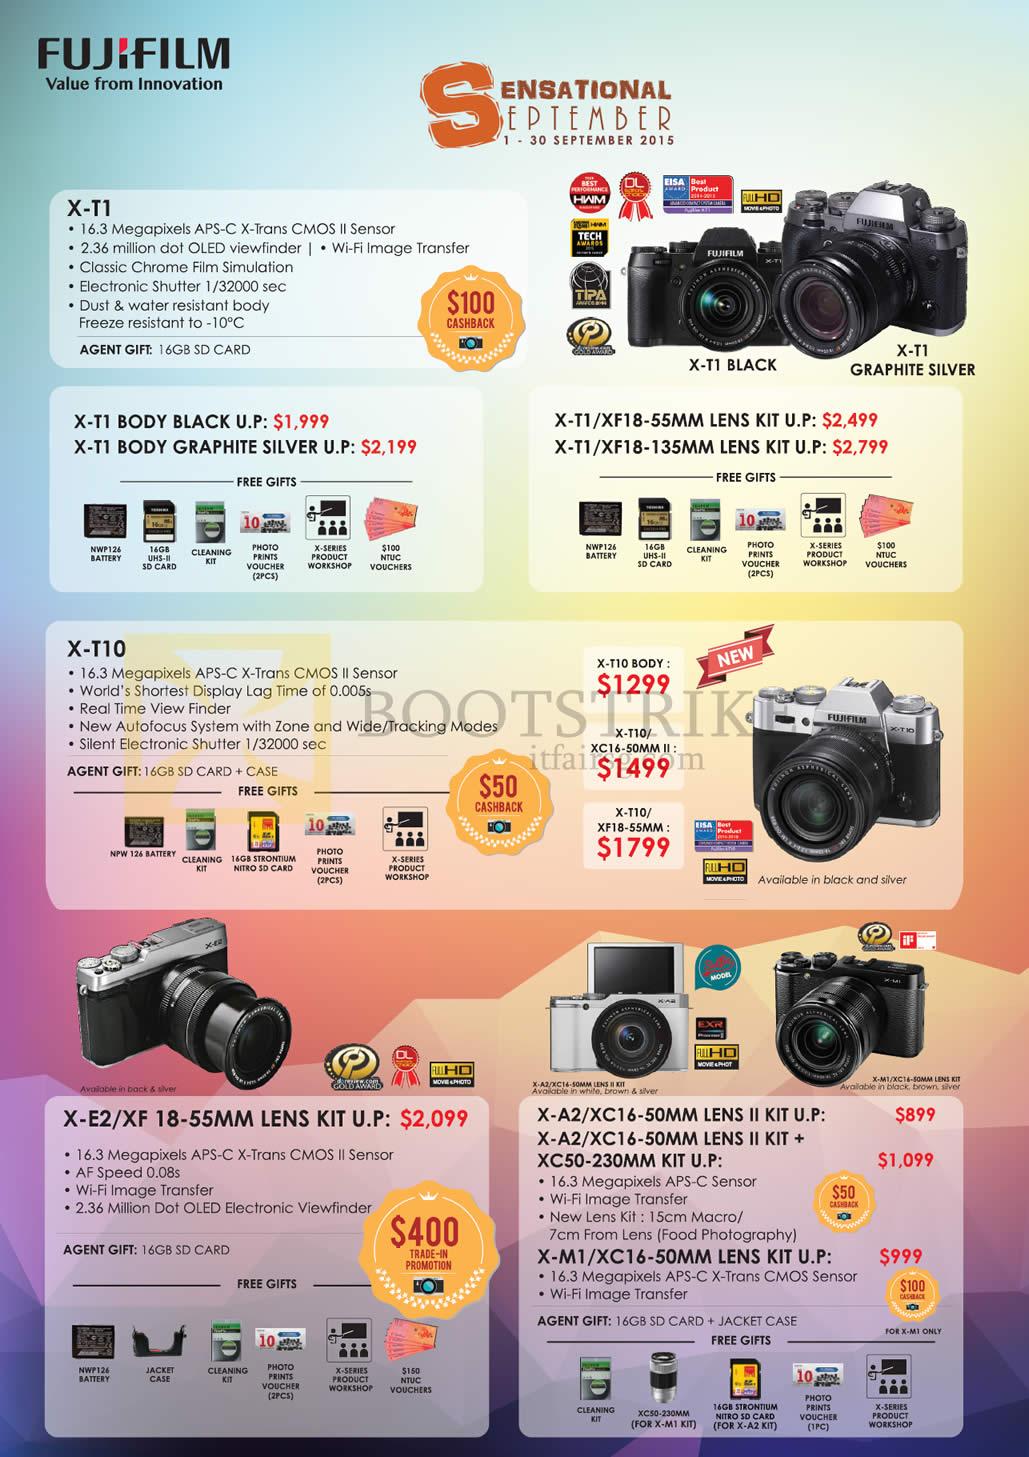 Fujifilm Digital Cameras X-T1, X-T10, X-E2, X-A2, XC-50, X-M1